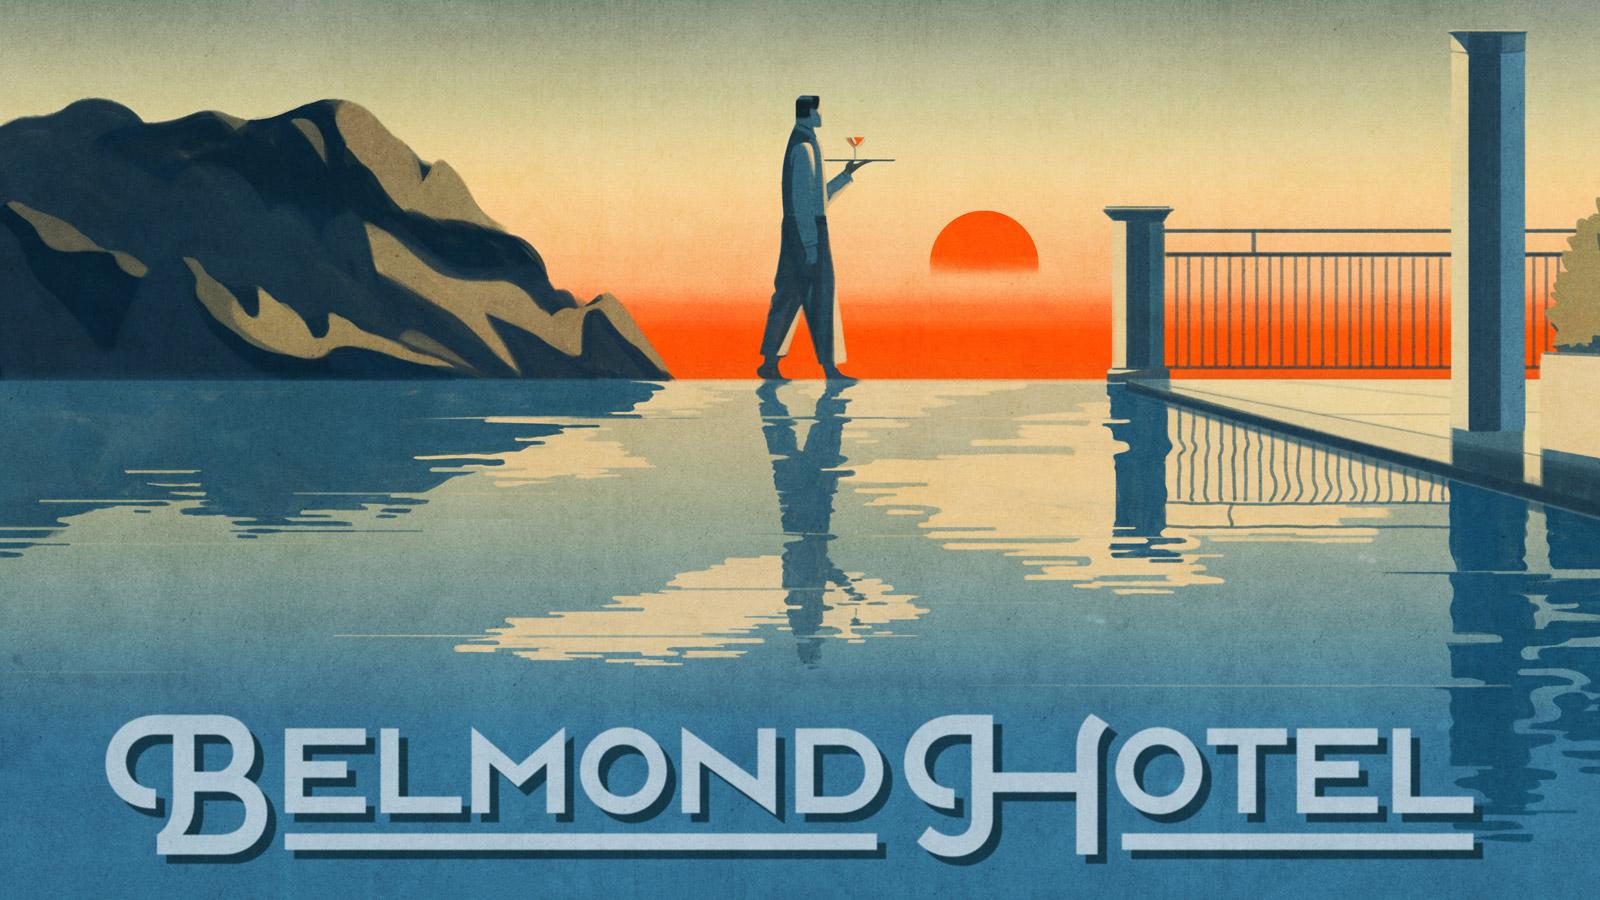 Belmond stickers